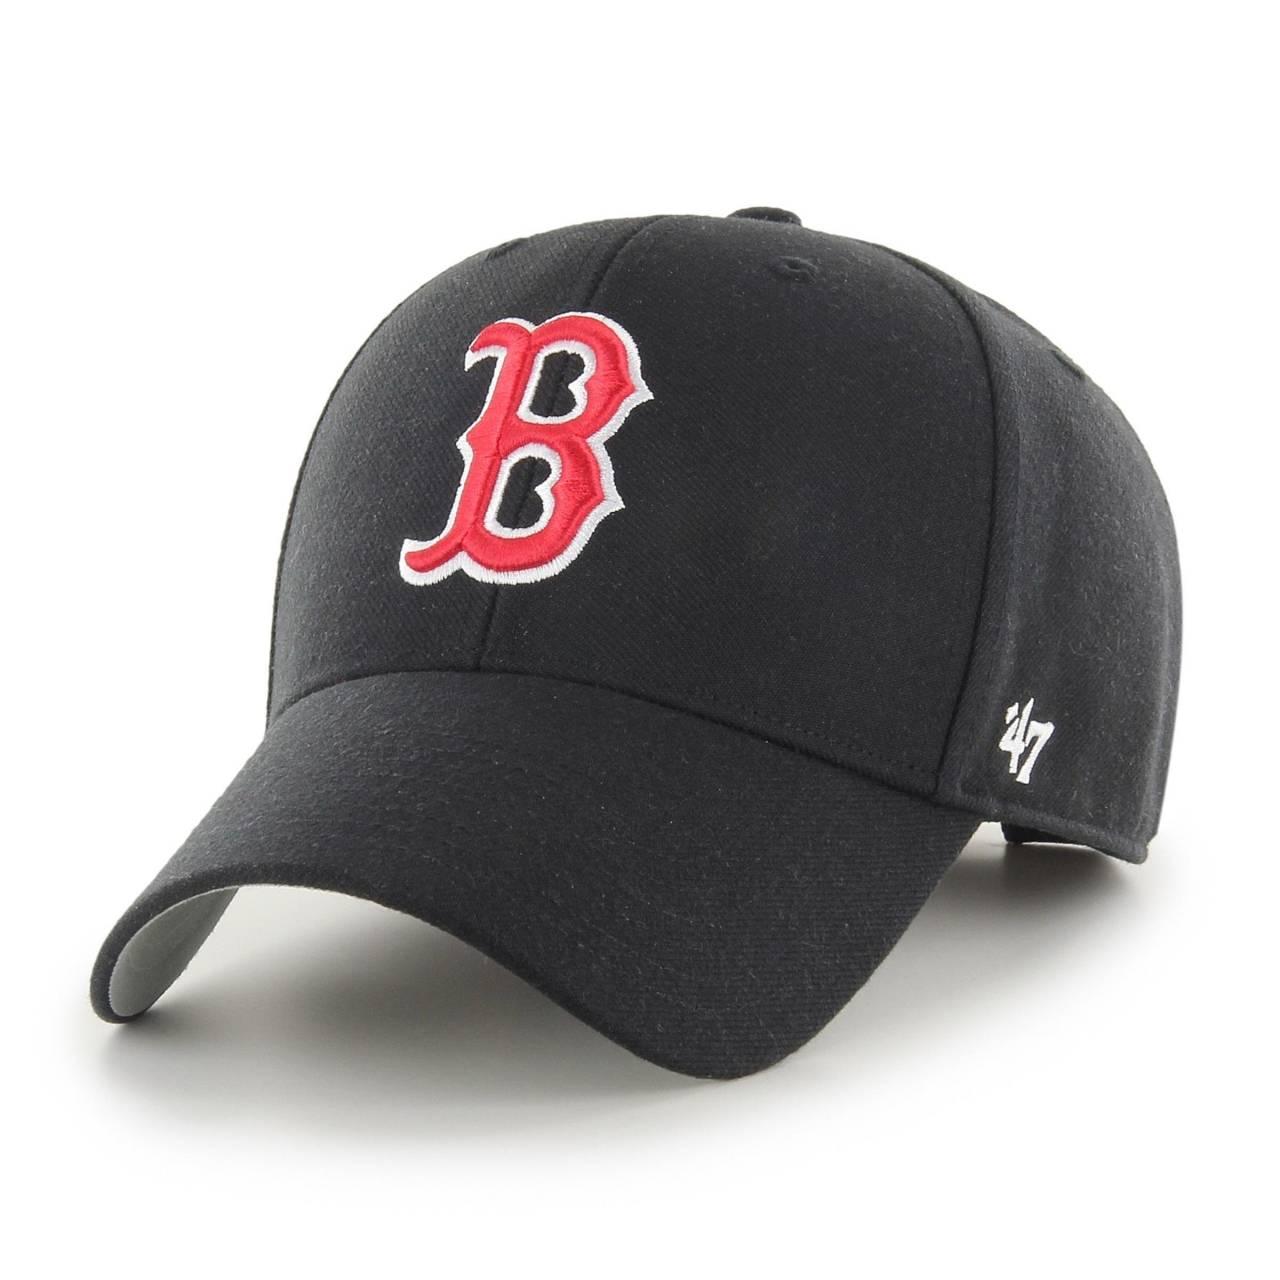 MLB BOSTON RED SOX '47 MVP CAP BLACK